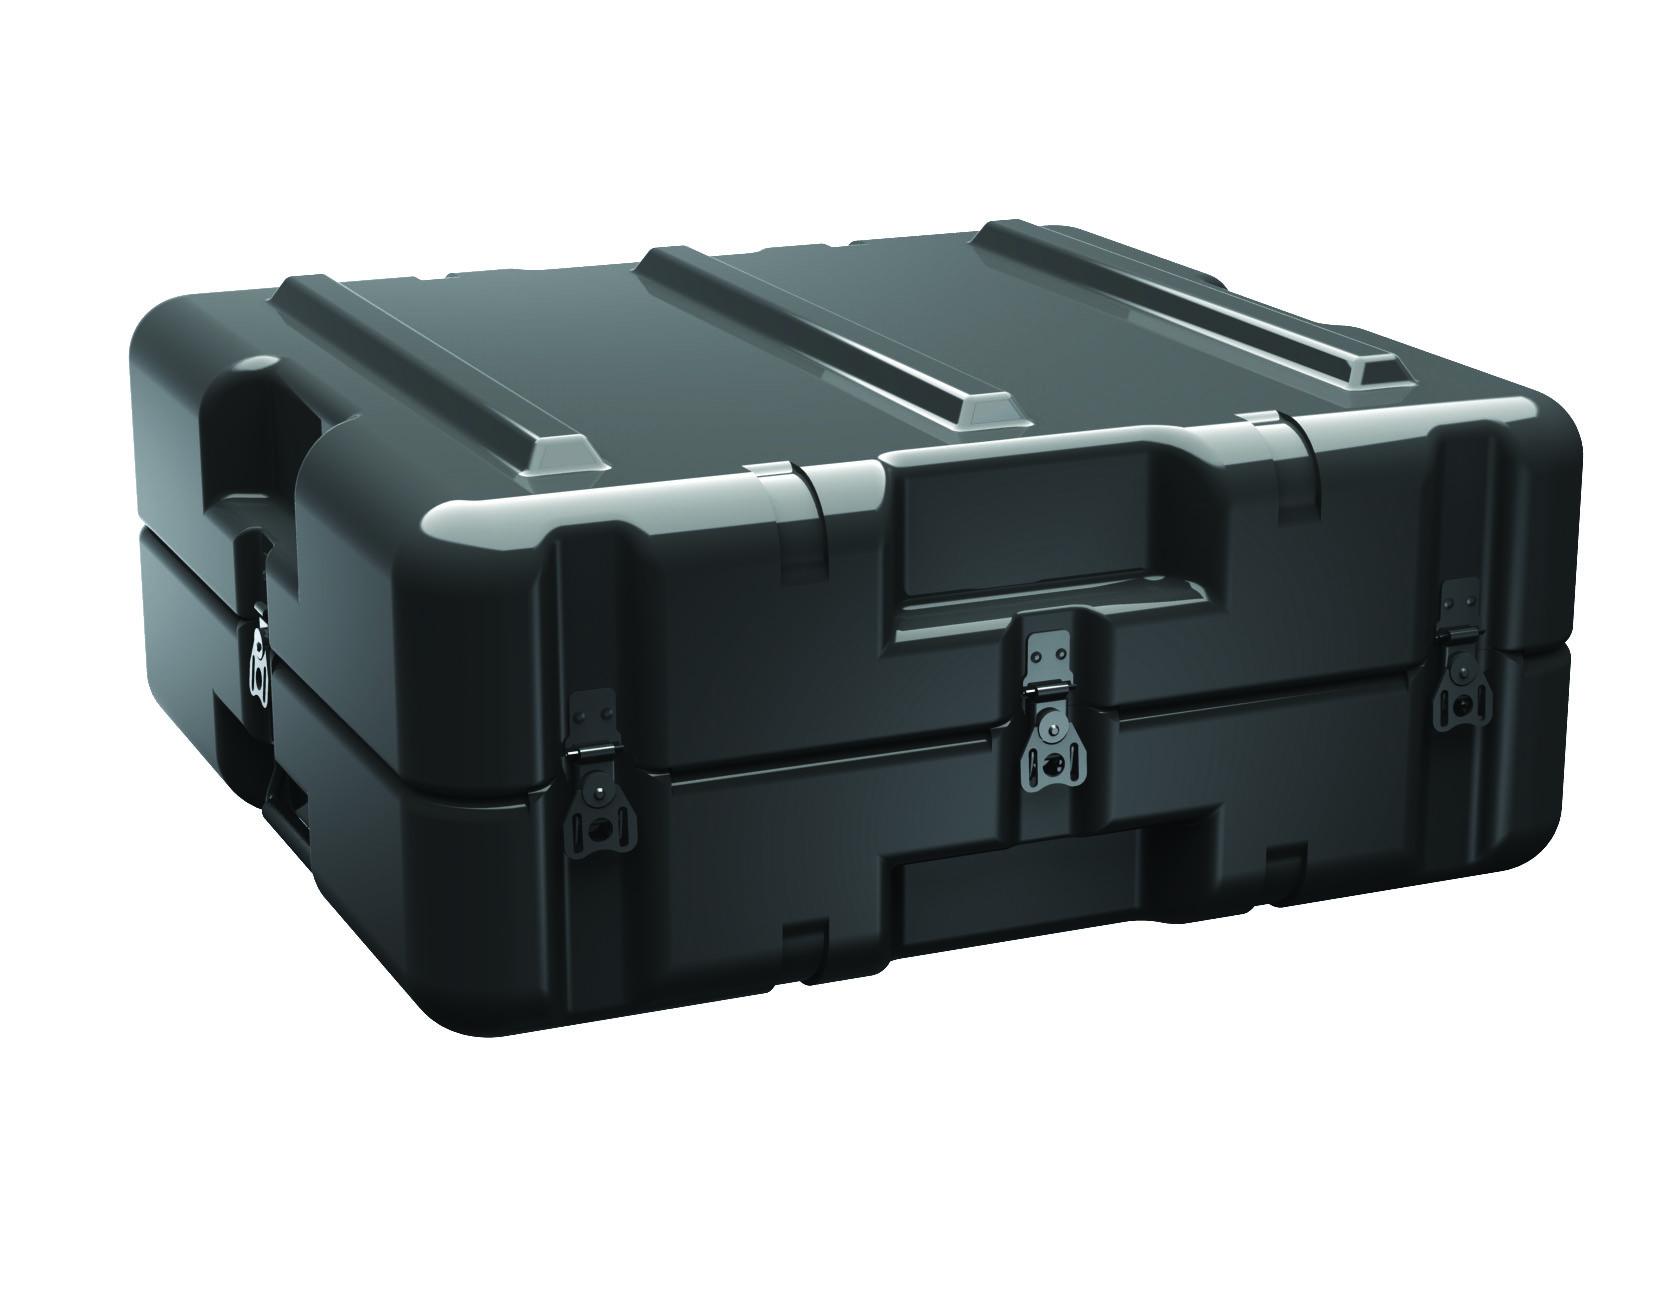 AL2221-0405 - AL2221-0405 Flat Case Removable Single Lid